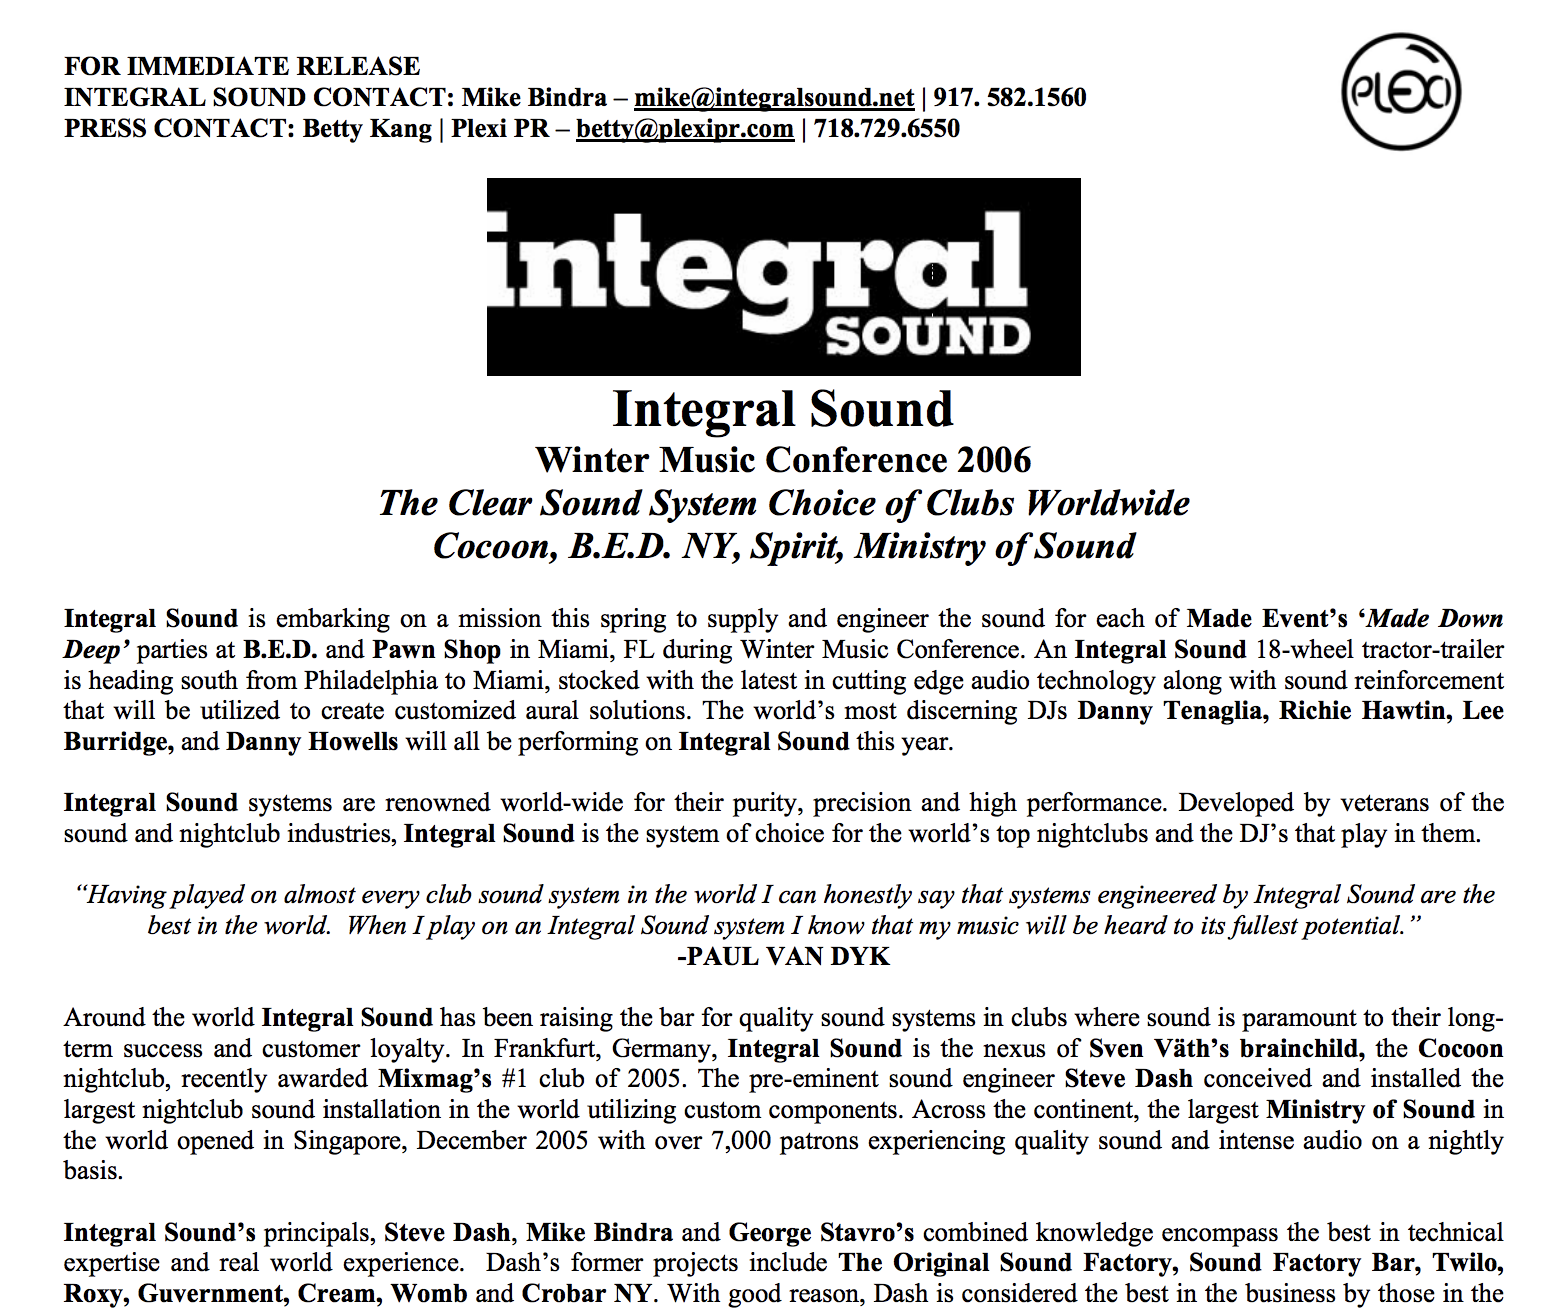 WMC 2006 Press Release